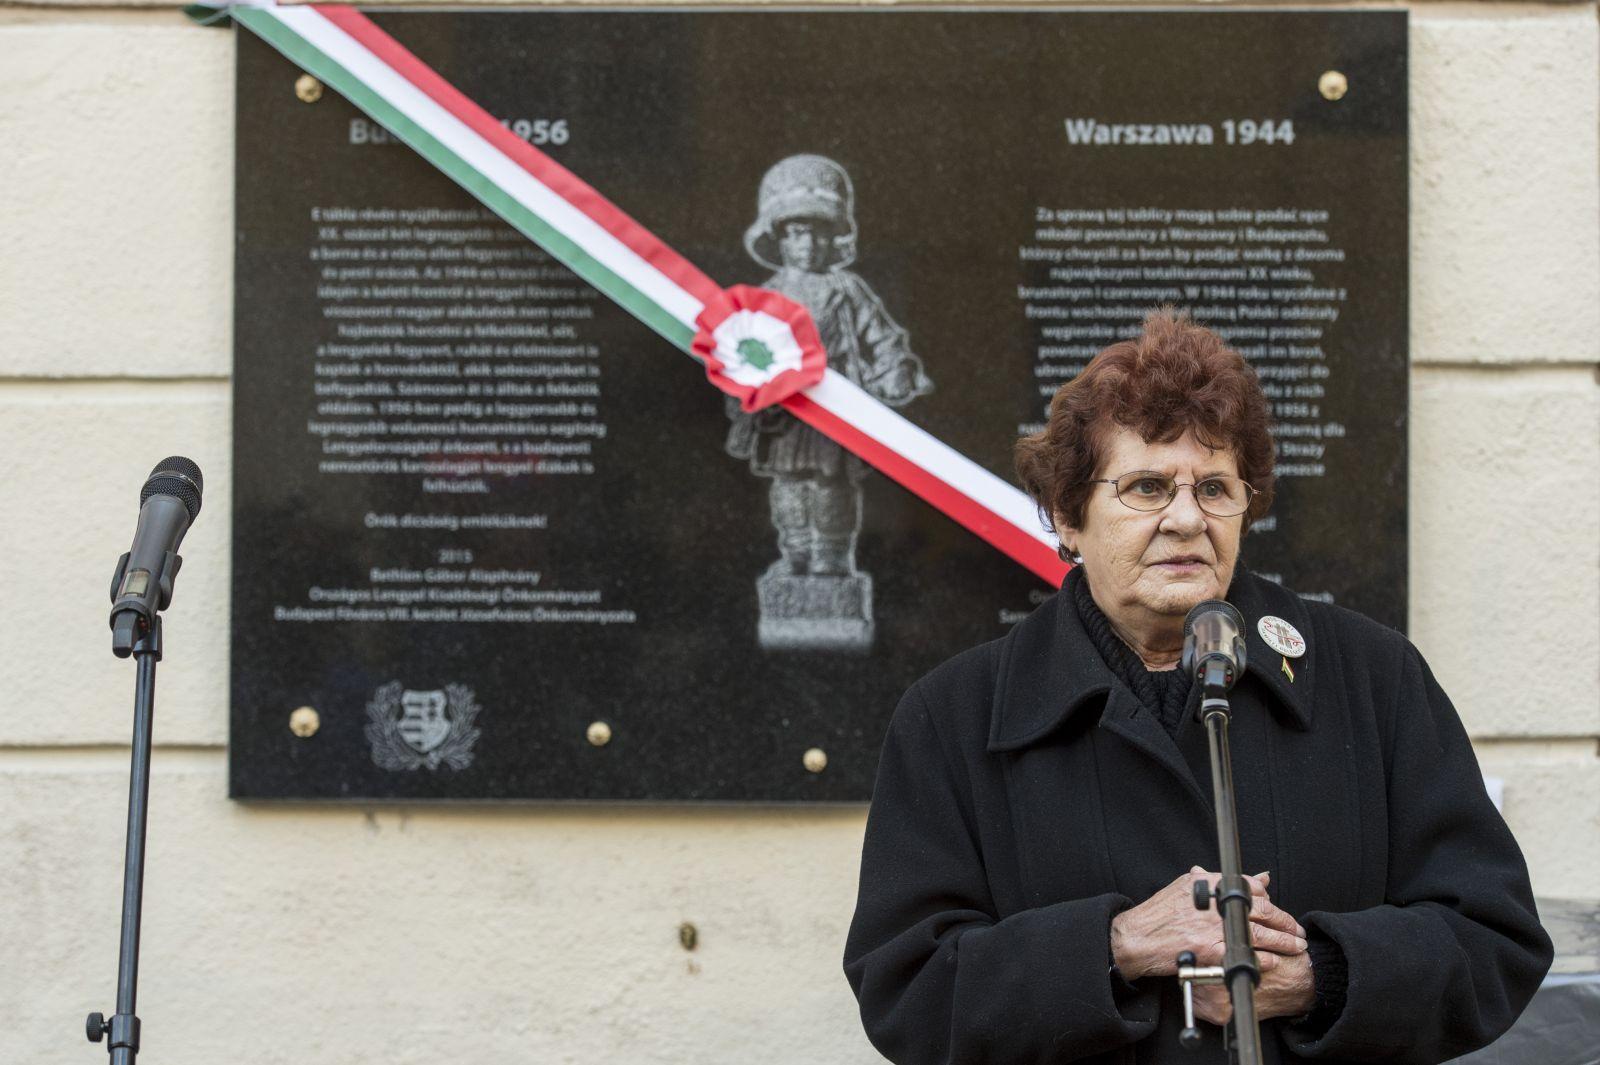 Megemlékezés a kommunista diktatúra áldozatairól